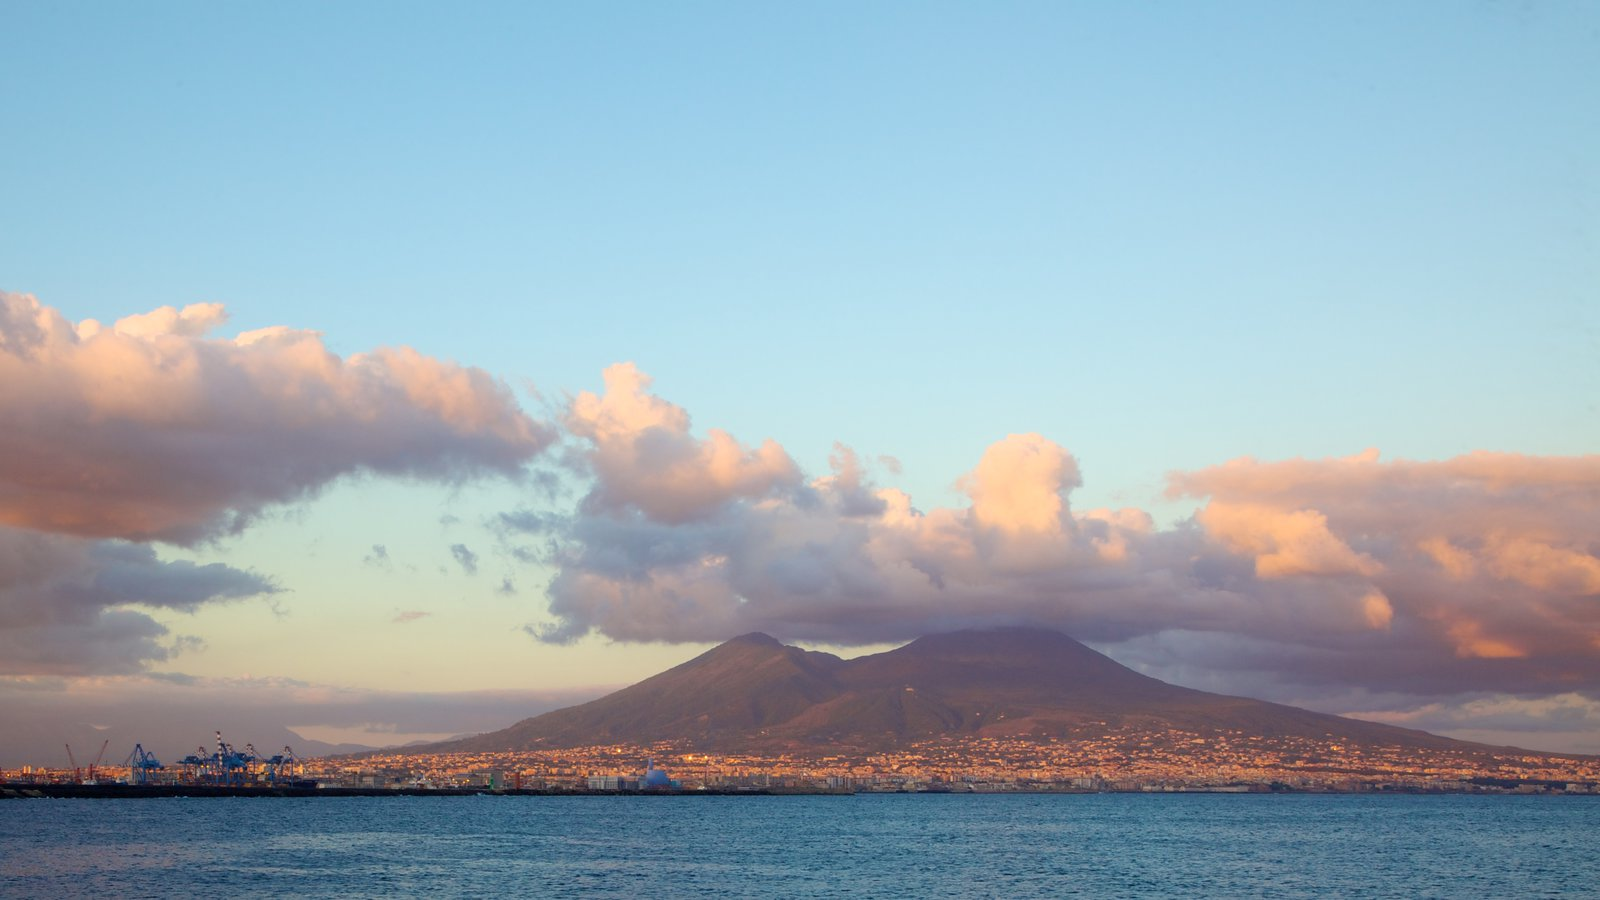 Mount Vesuvius - Pompei featuring mountains and general coastal views